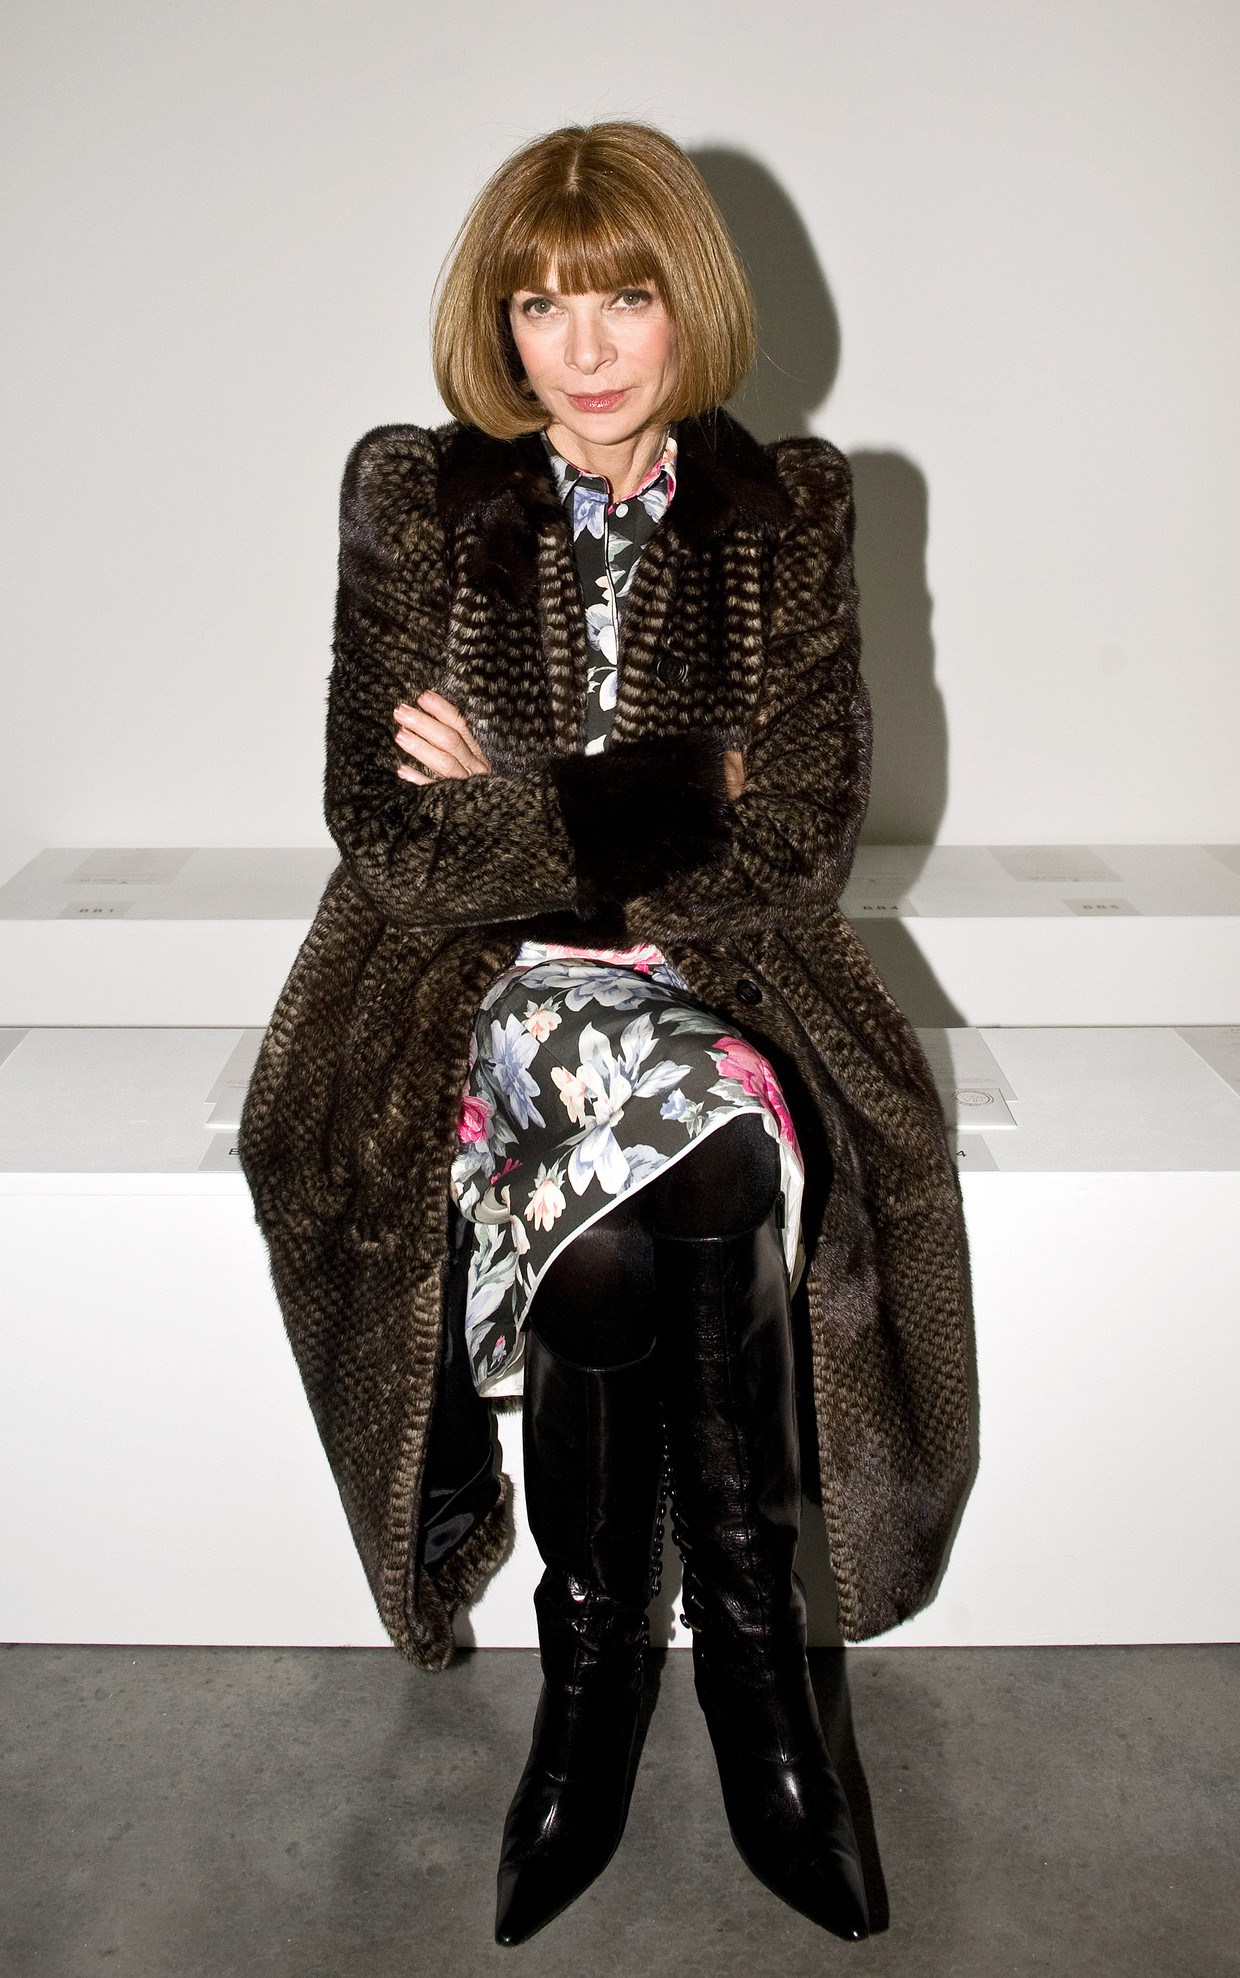 Anna Wintour tijdens de London Fashion Week in 2012. Beeld Getty Images